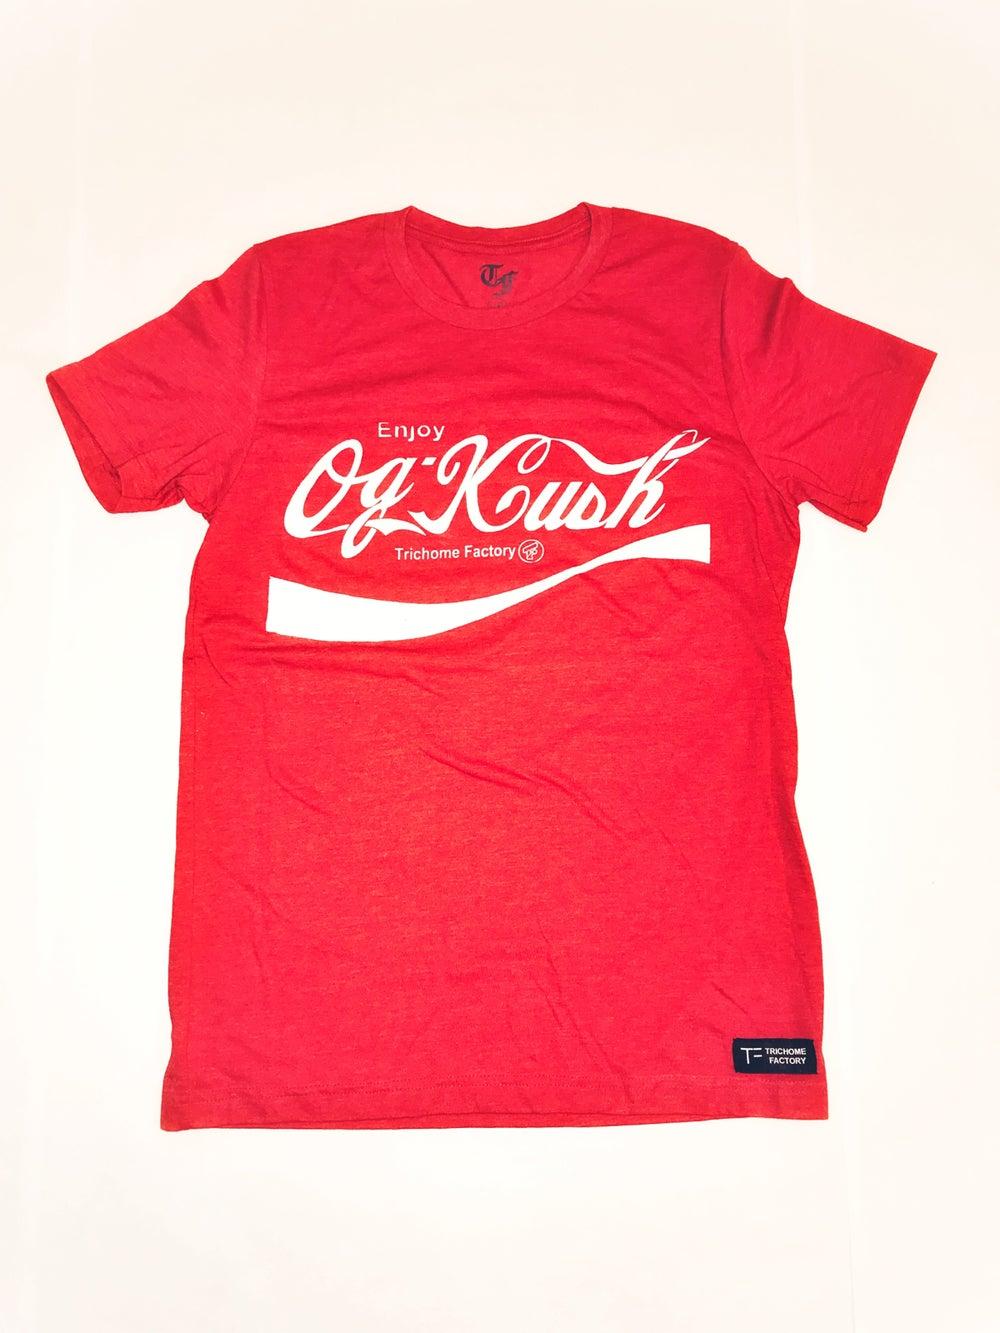 Image of Original OG Kush Classic Red T-Shirt